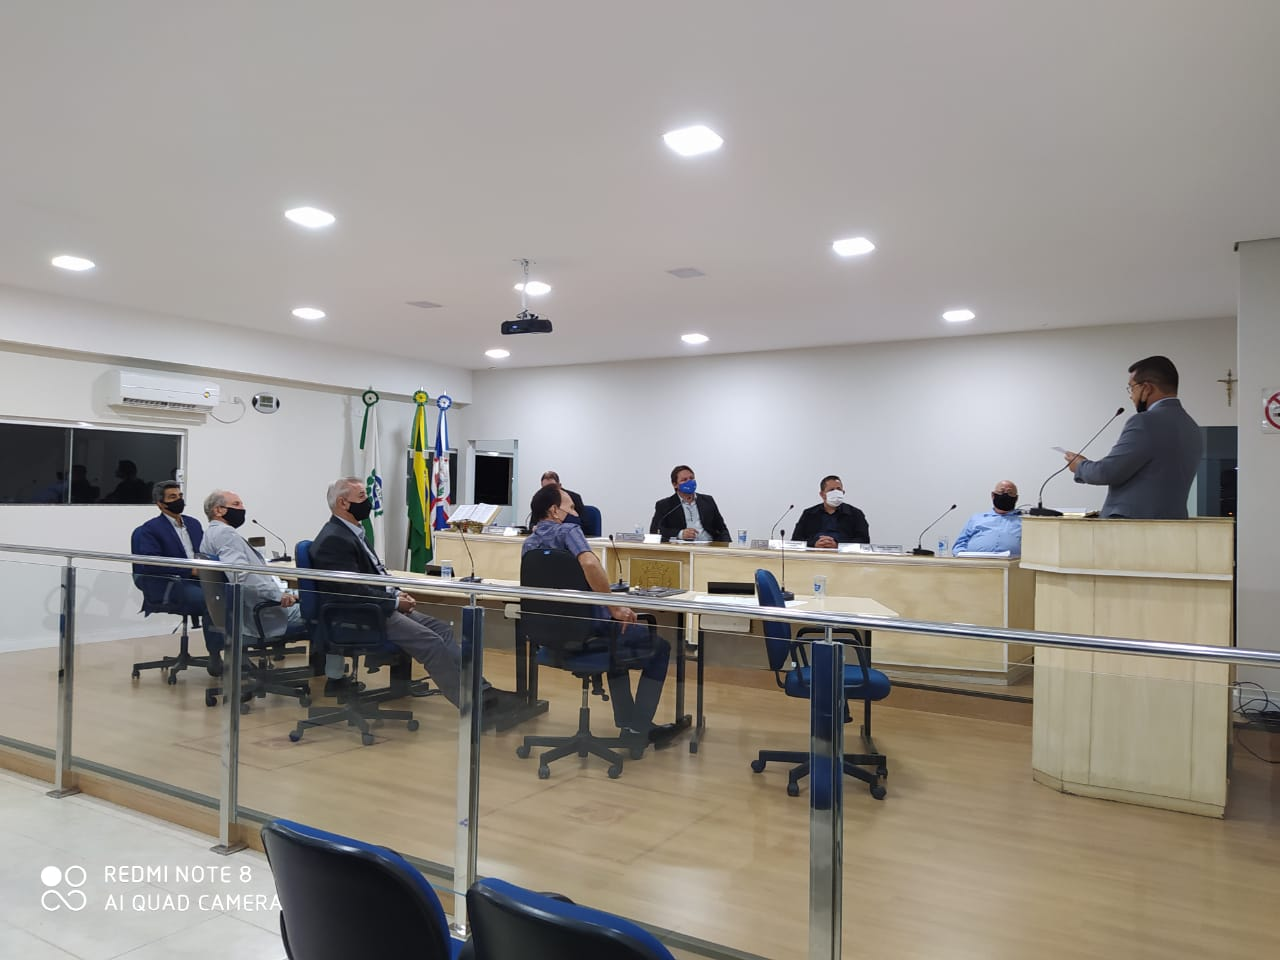 Dia da Bíblia na Câmara Municipal